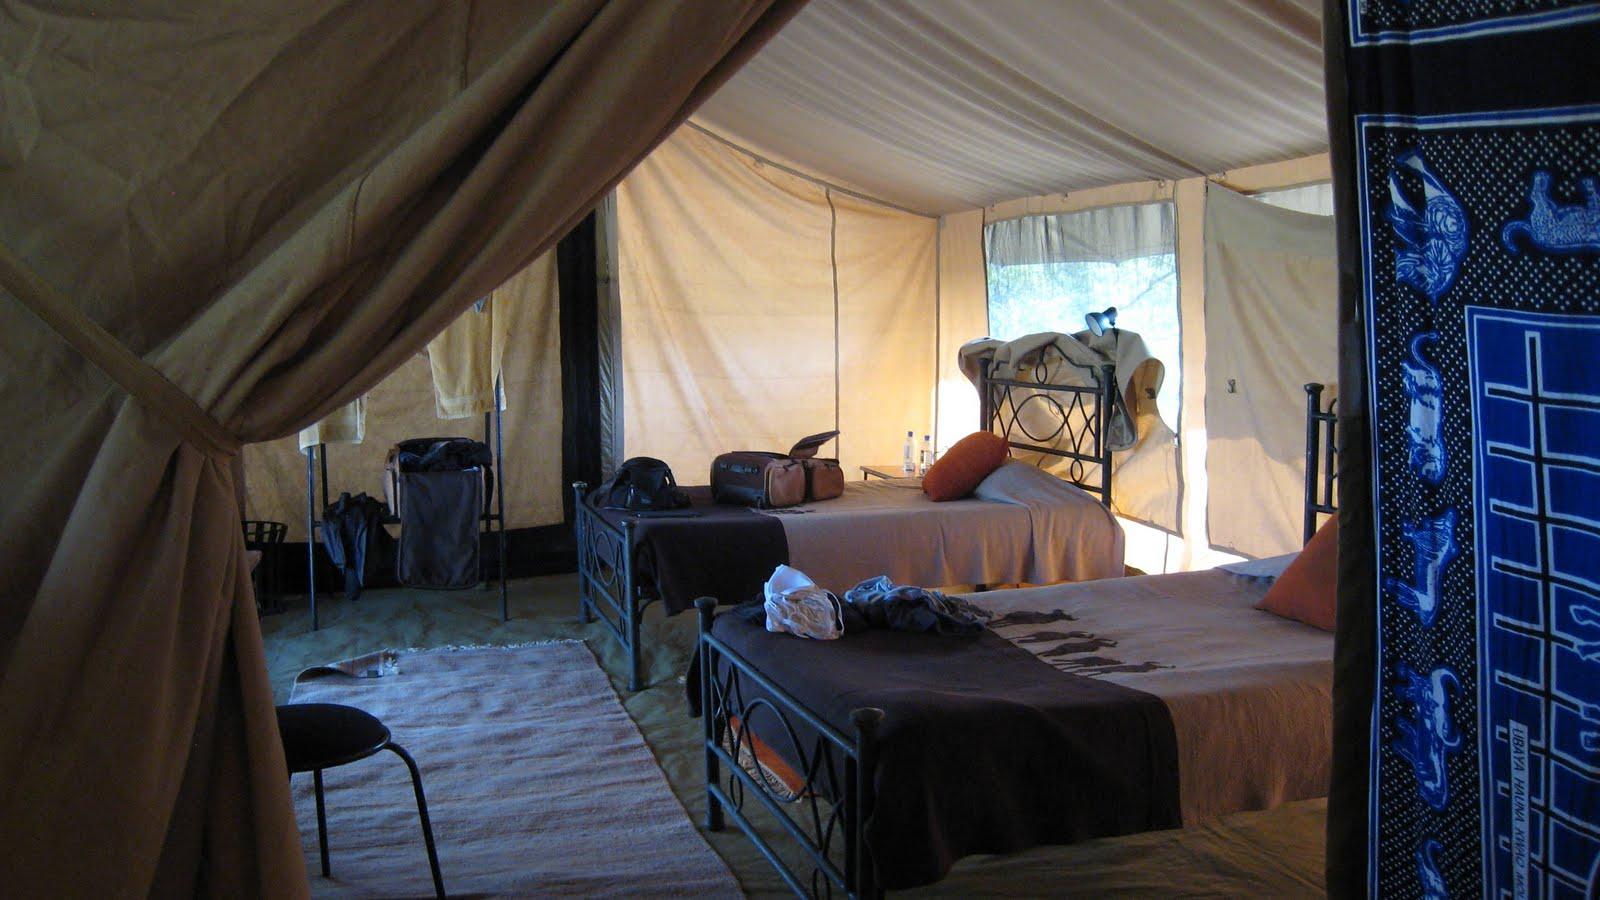 ... Kusini luxury tented c&Kleins c&Losirwa Luxury c& Migunga forest c& Kirurumu luxury tented c&sLake Manyara view lodge Tarangire safari ... & Tanzania wildlife safari destinations climbing kilimanjaro ...